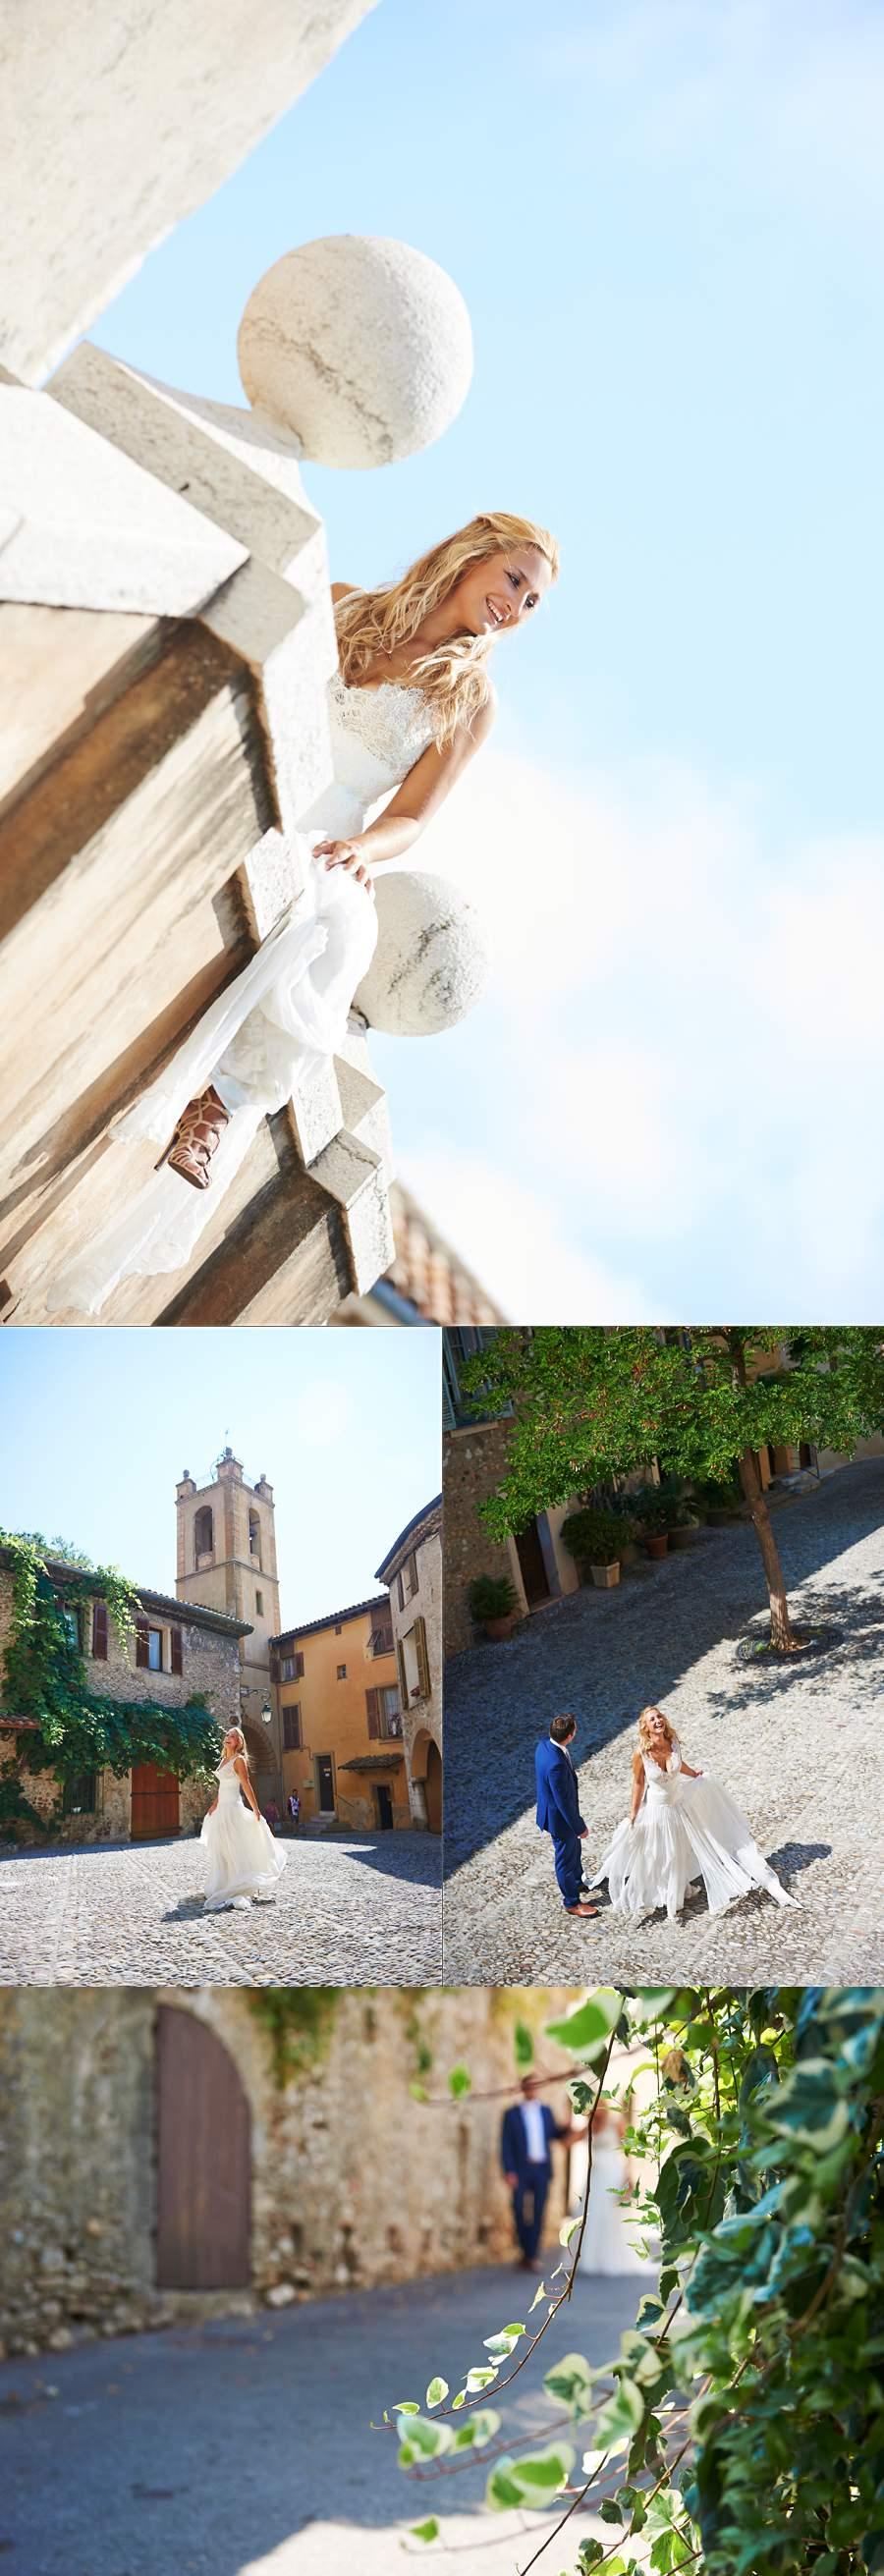 Stavros Efi wedding photos03